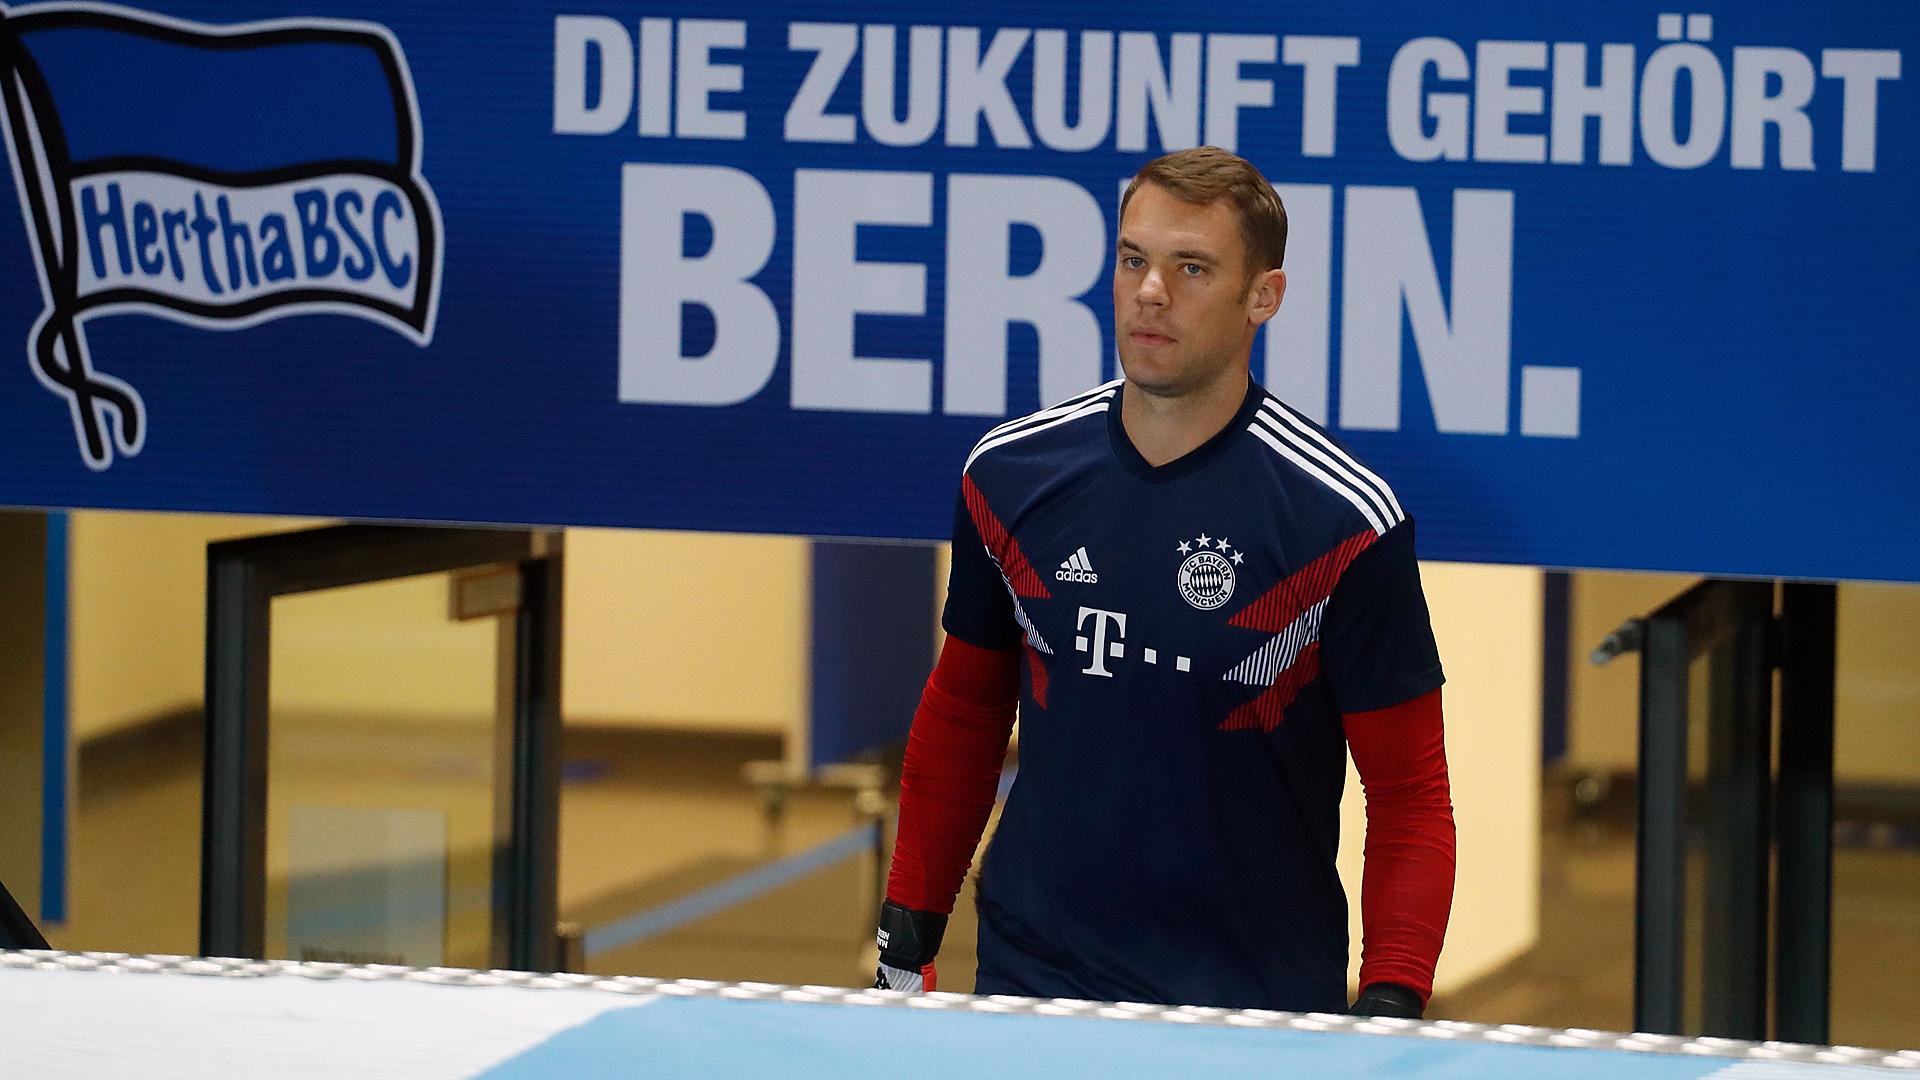 Manuel Neuer FC Bayern Hertha